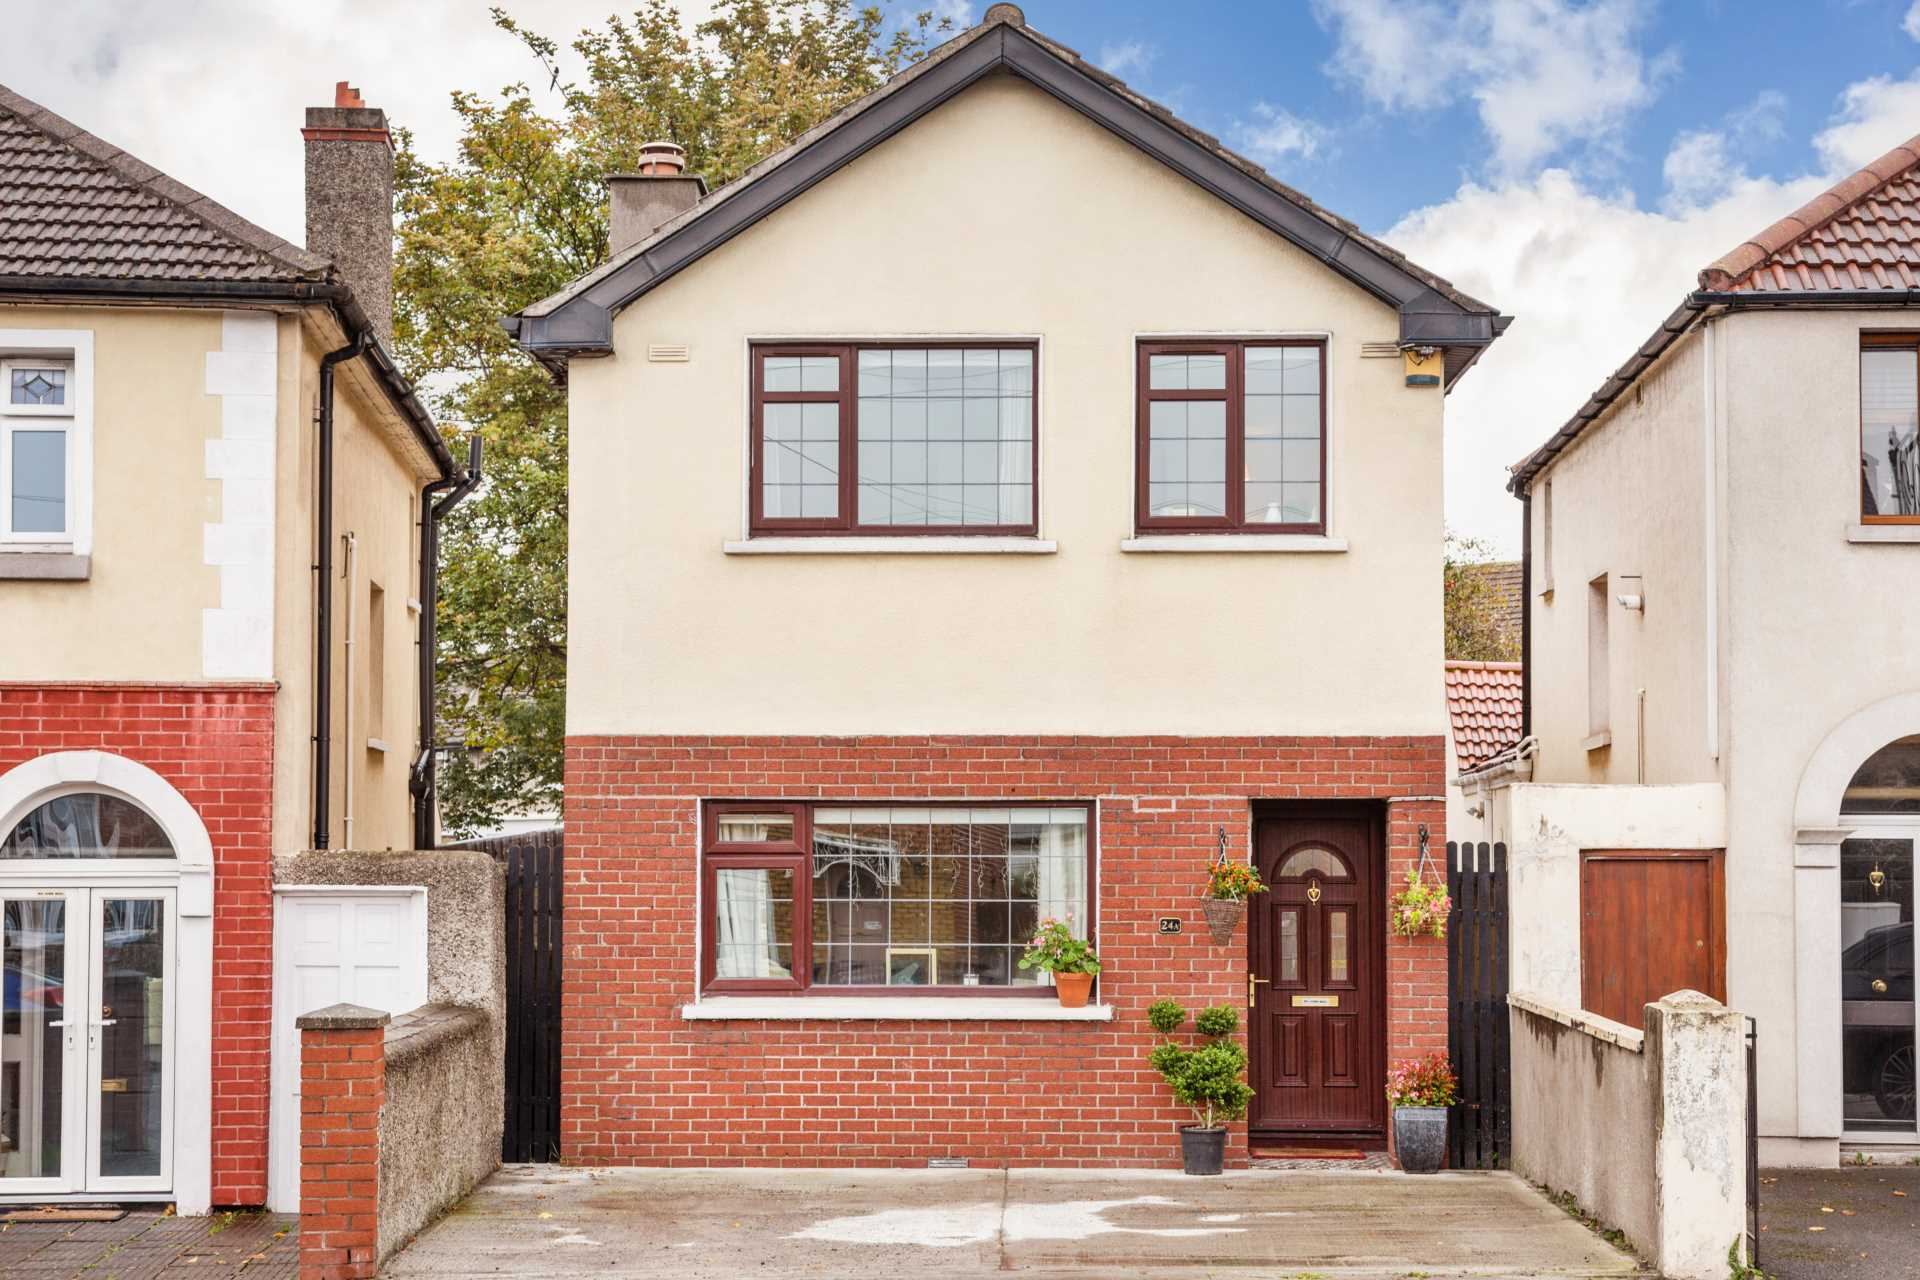 24a Herberton Road, Crumlin, Dublin 12, Image 1